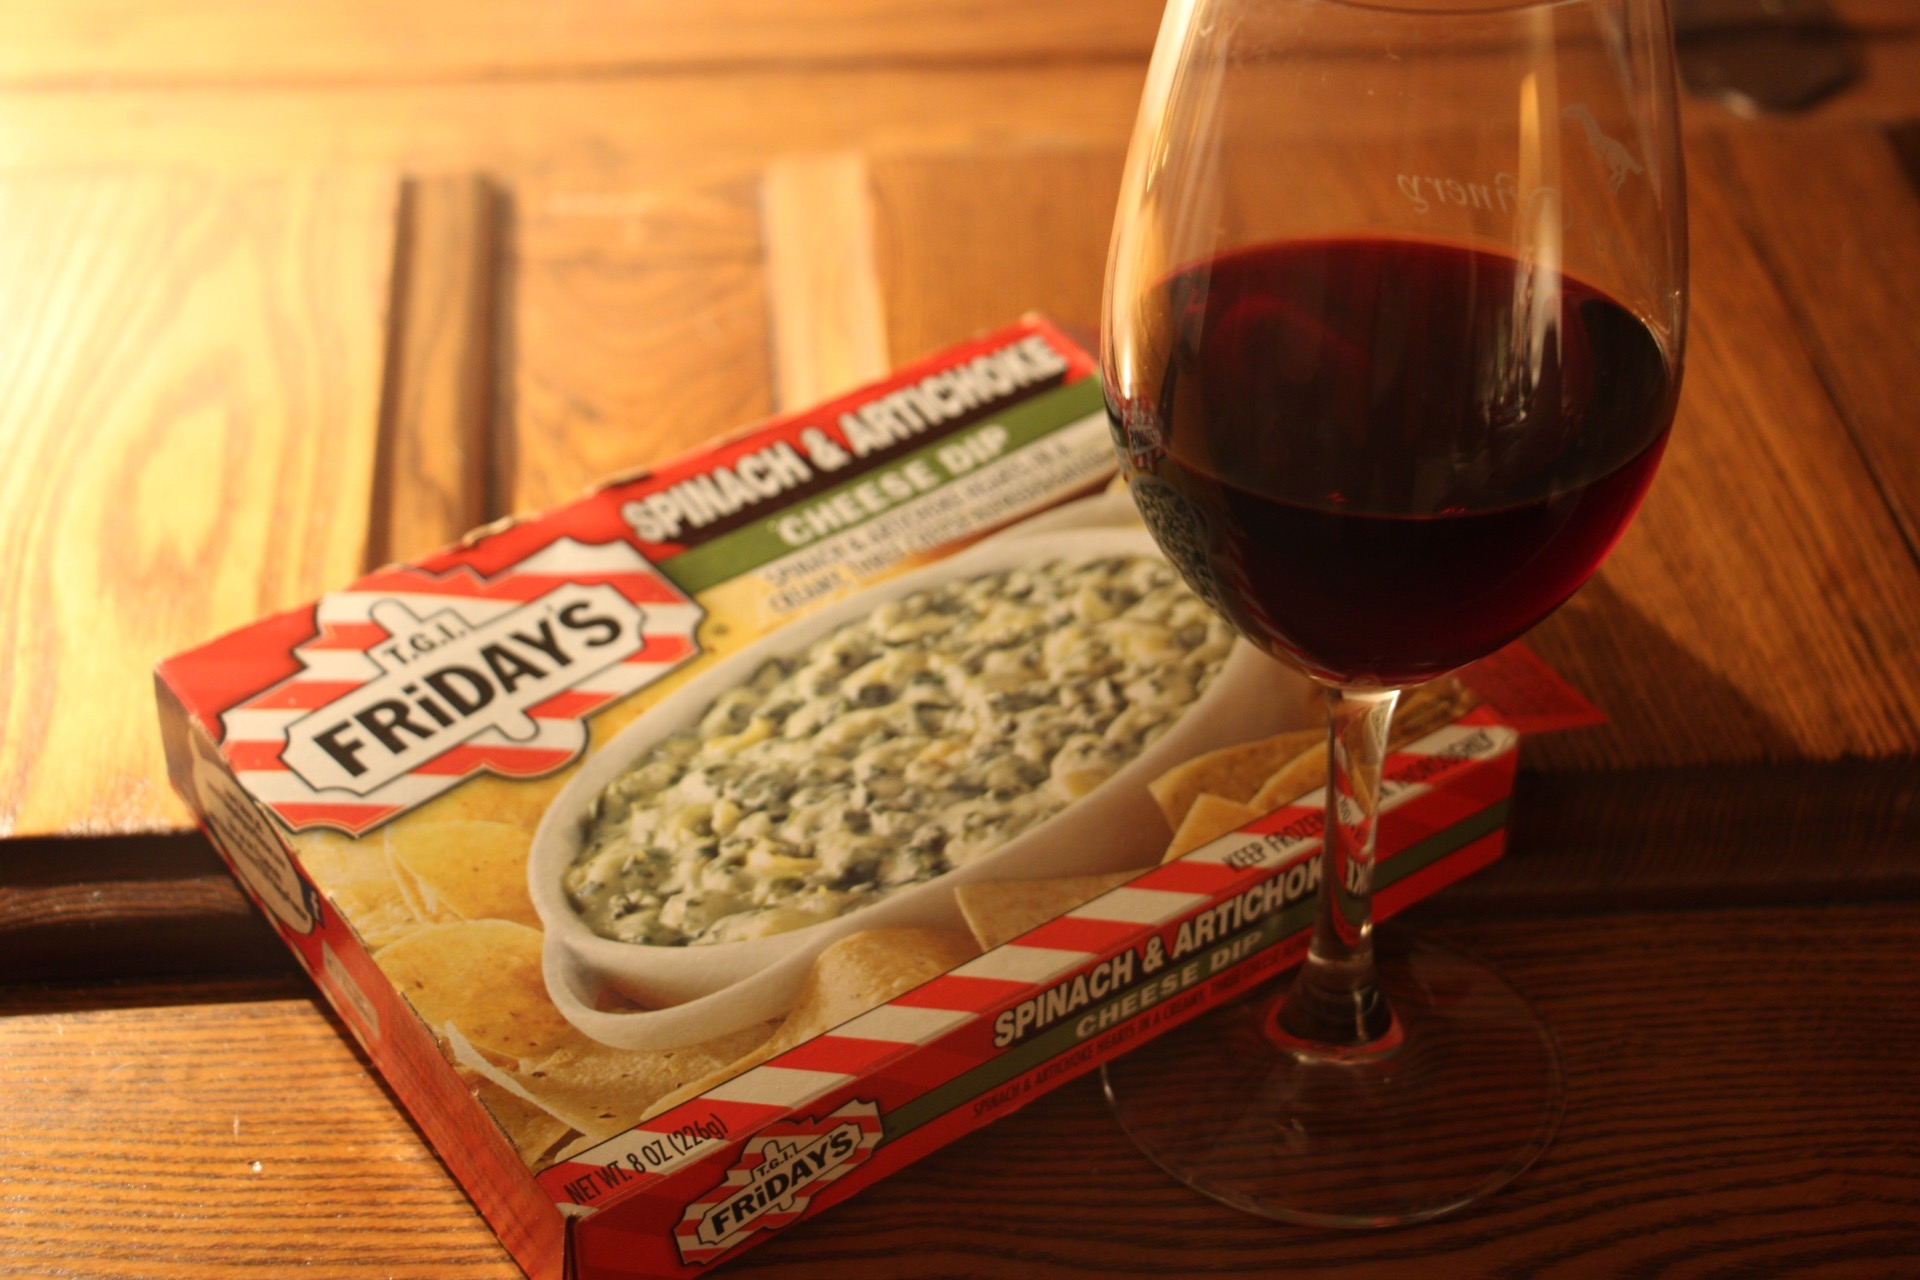 the wine idiot trader joe's wine reviews valreas cuvee prestige cotes du rhone villages red table wine